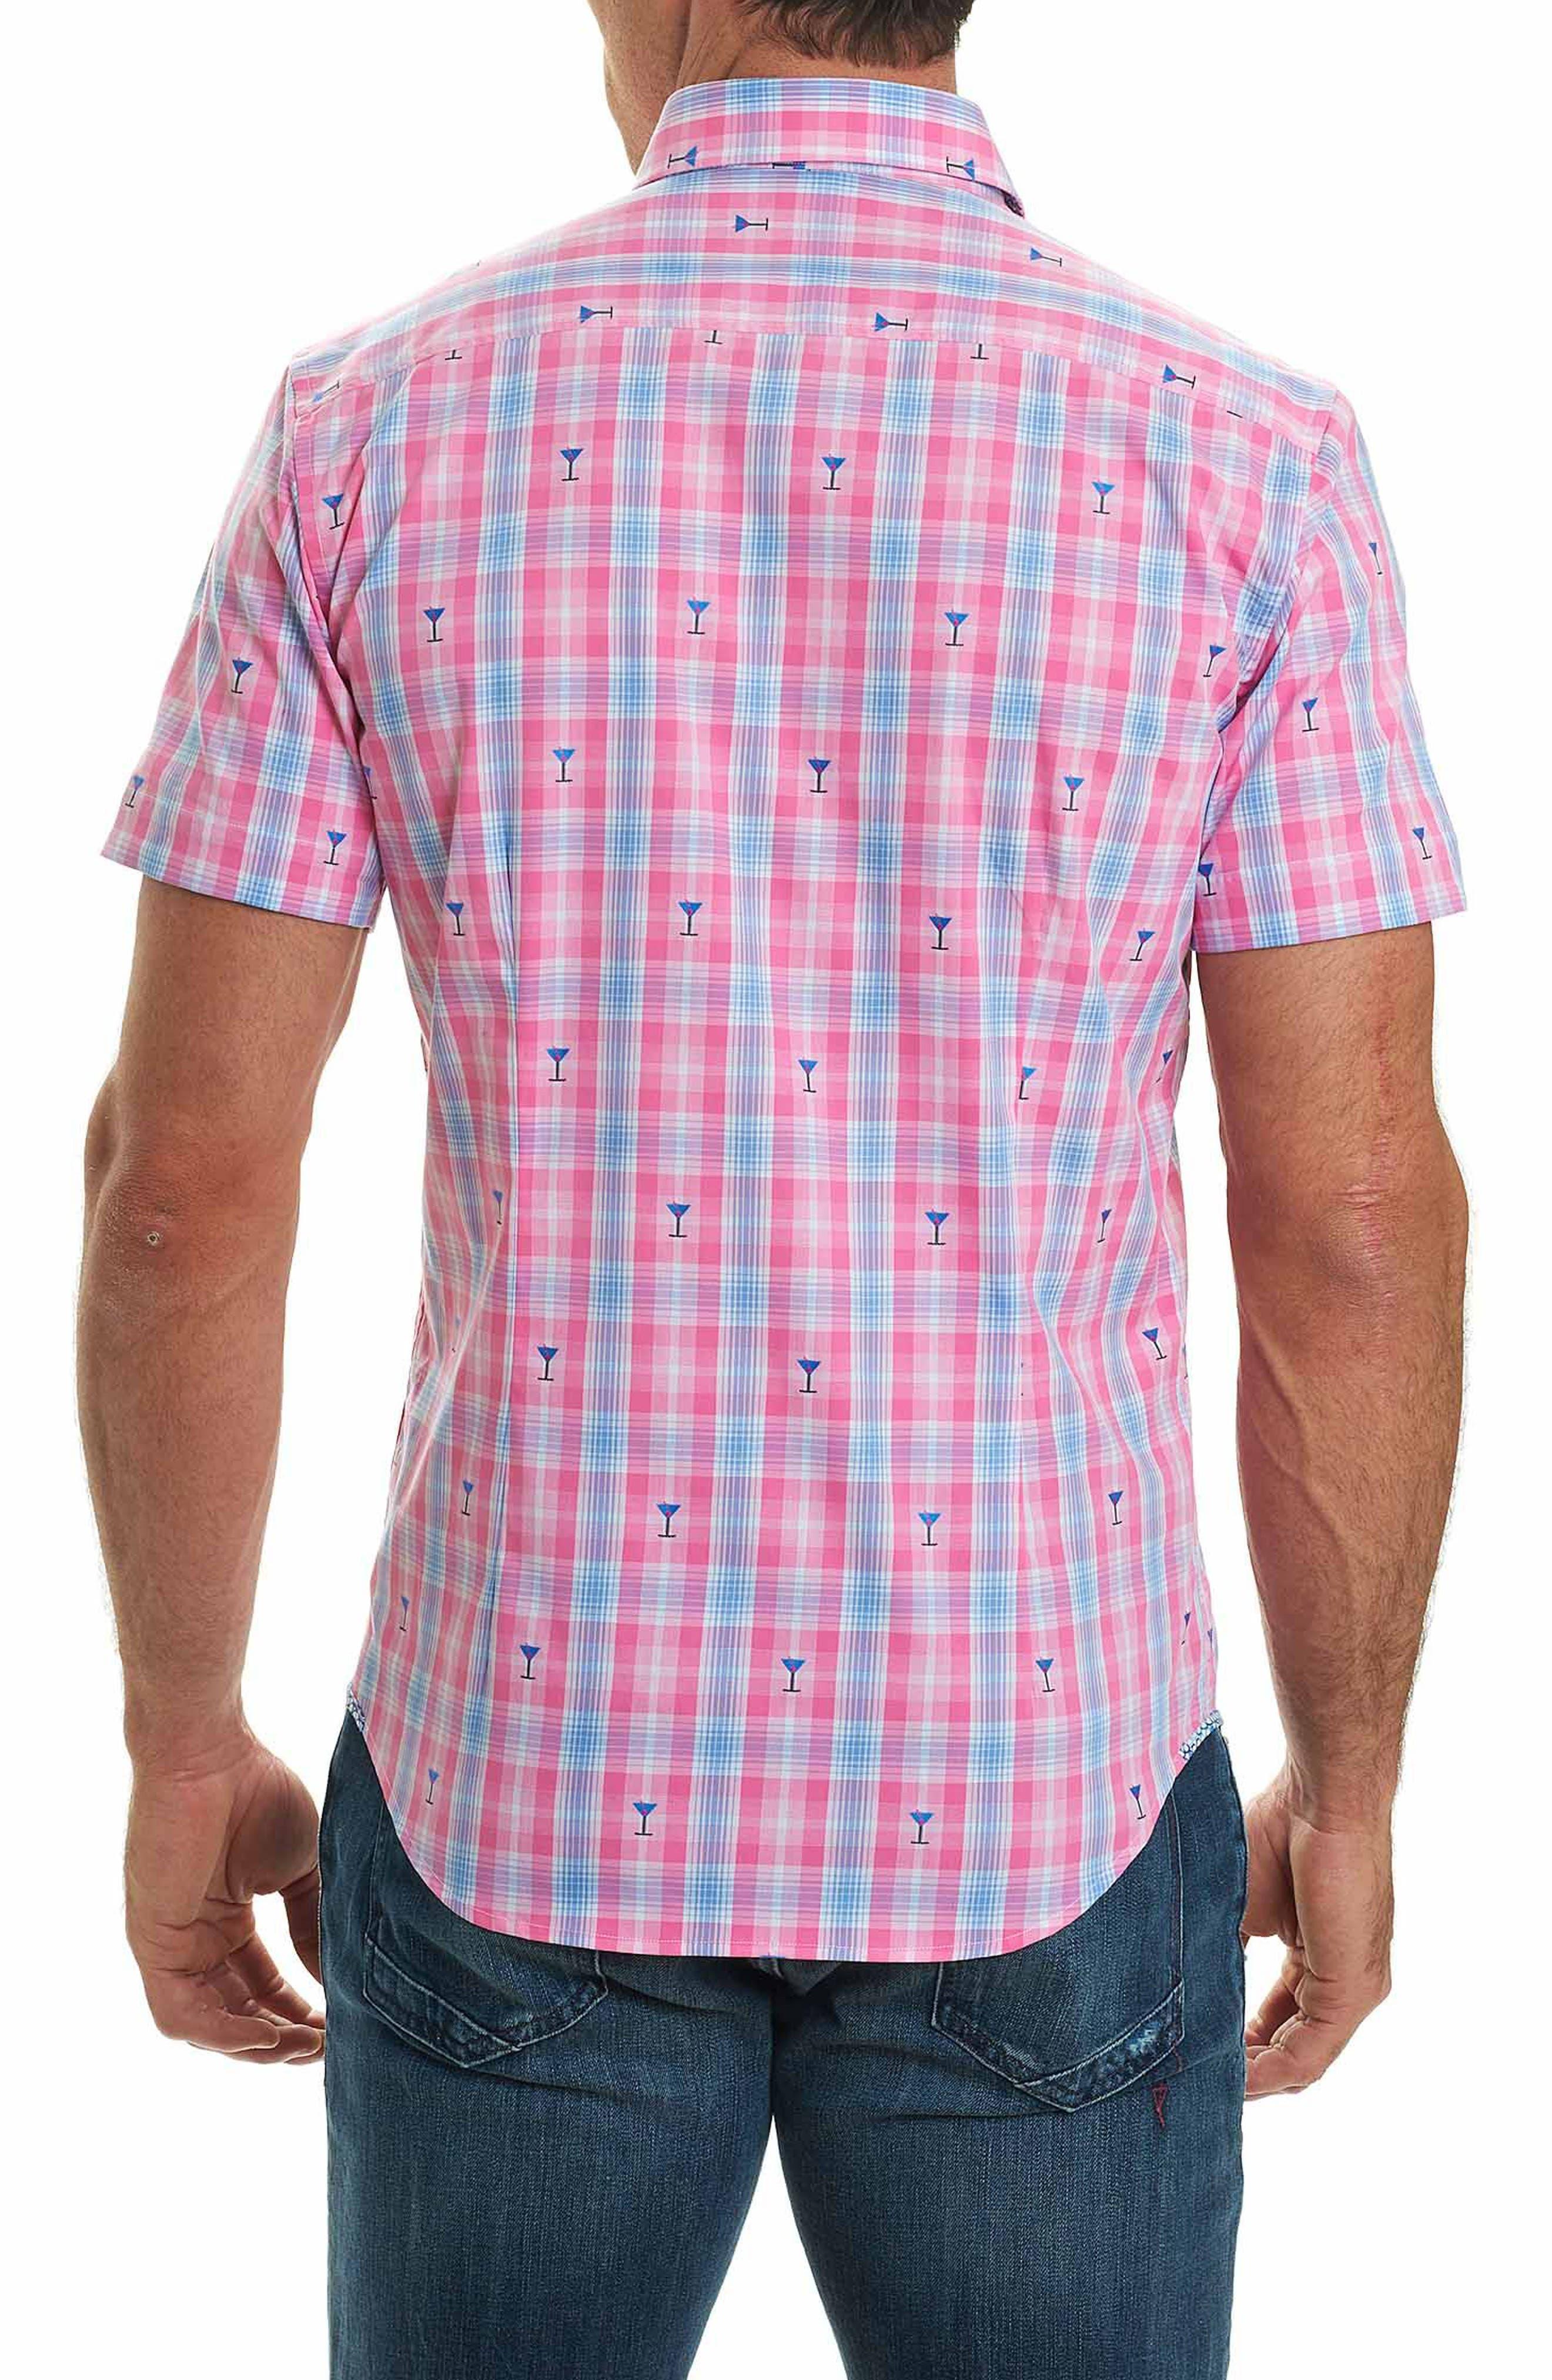 Chancellor Martini Plaid Sport Shirt,                             Alternate thumbnail 2, color,                             650